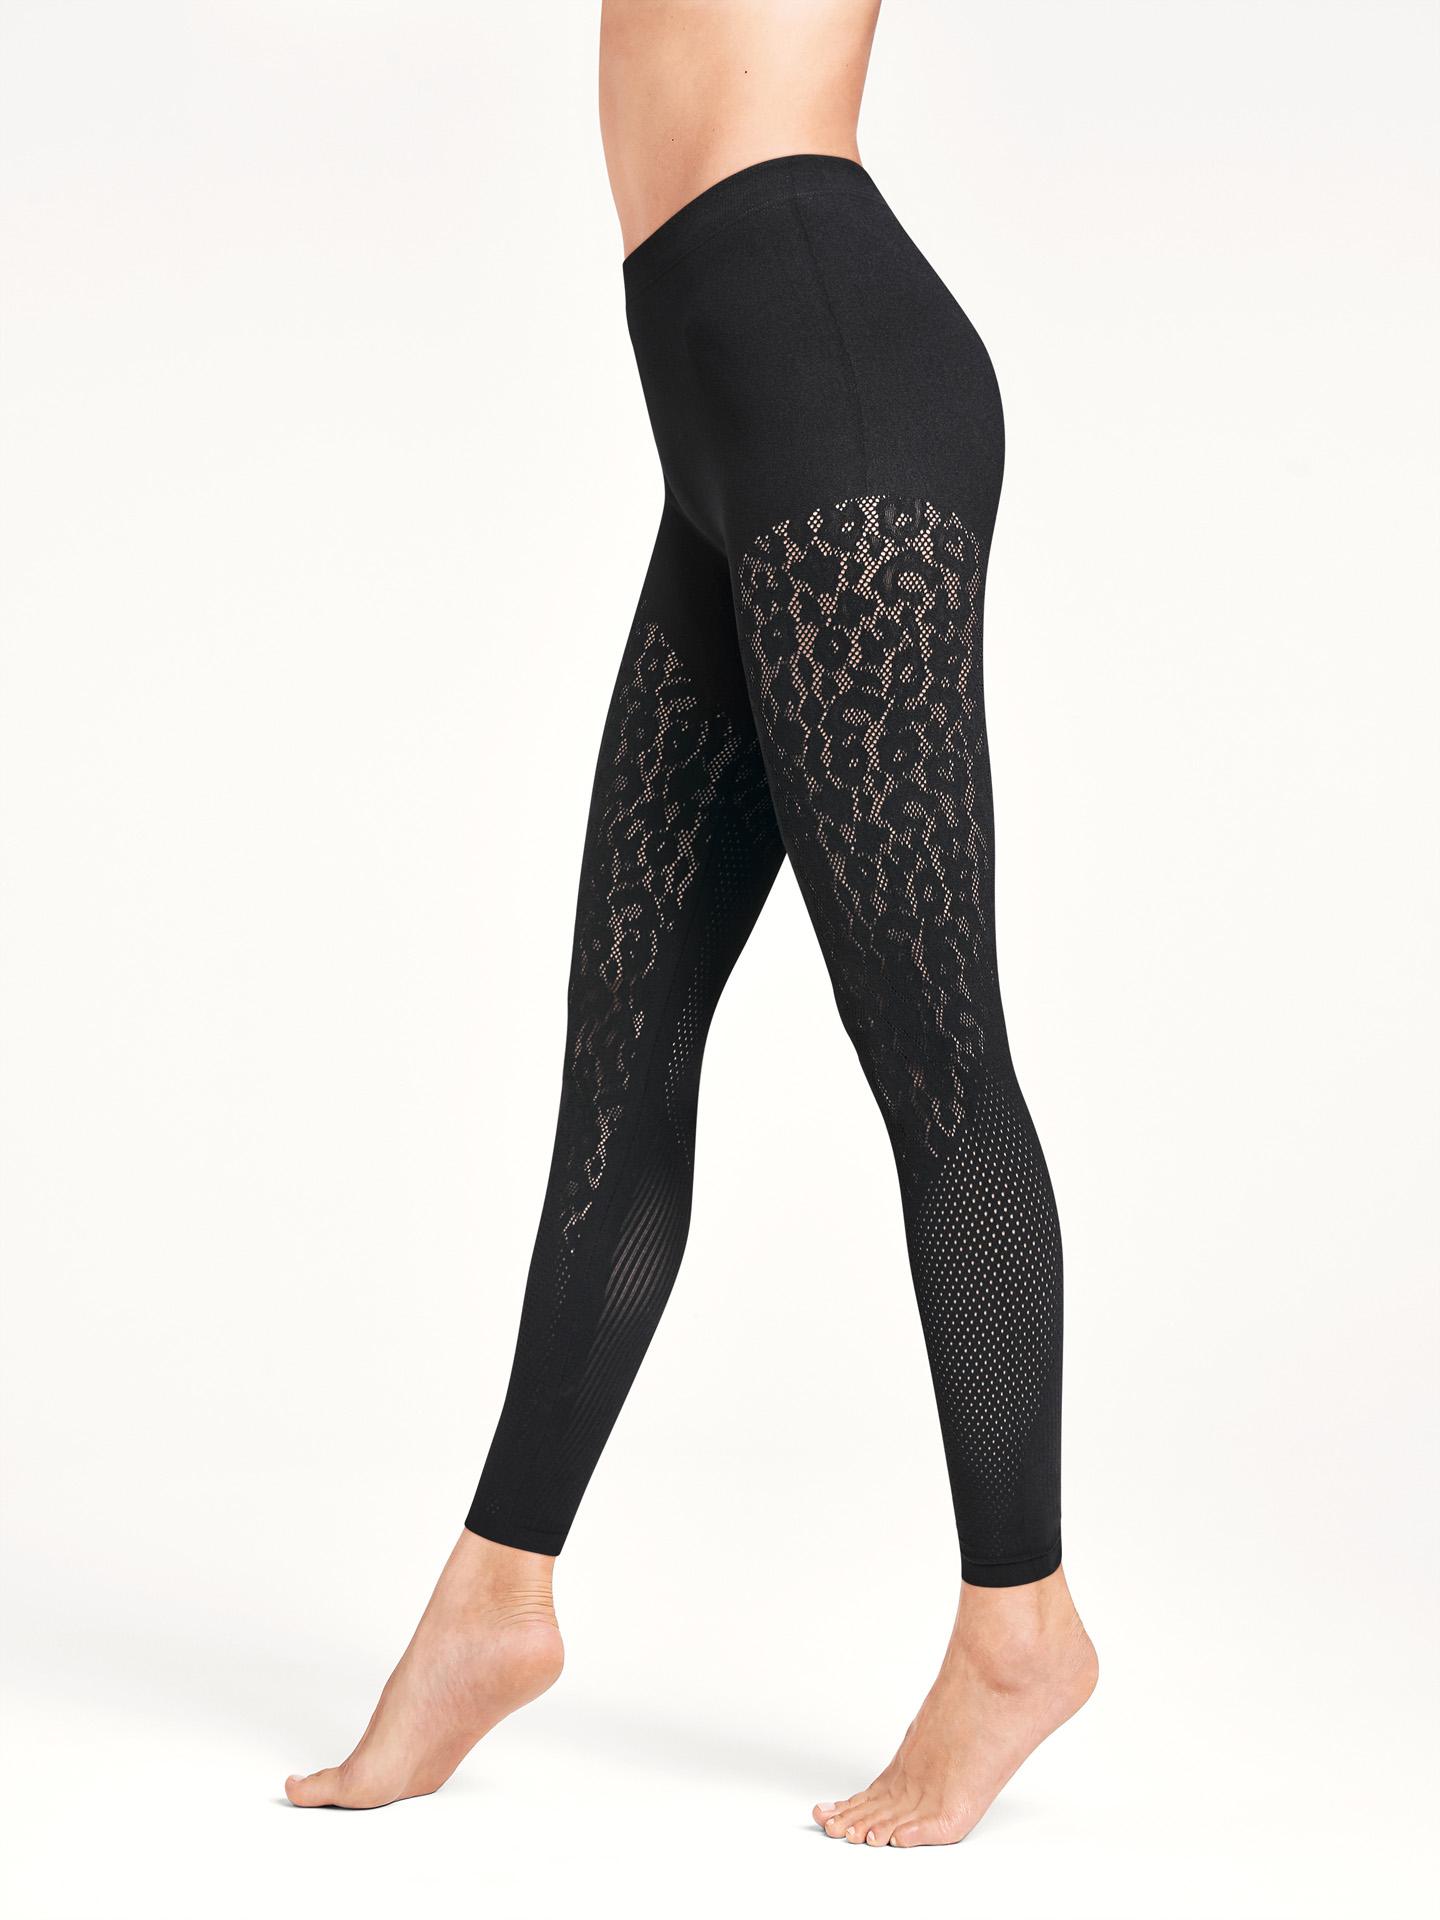 Wolford Apparel & Accessories > Clothing > ATH_W Cheetah Net Leggings